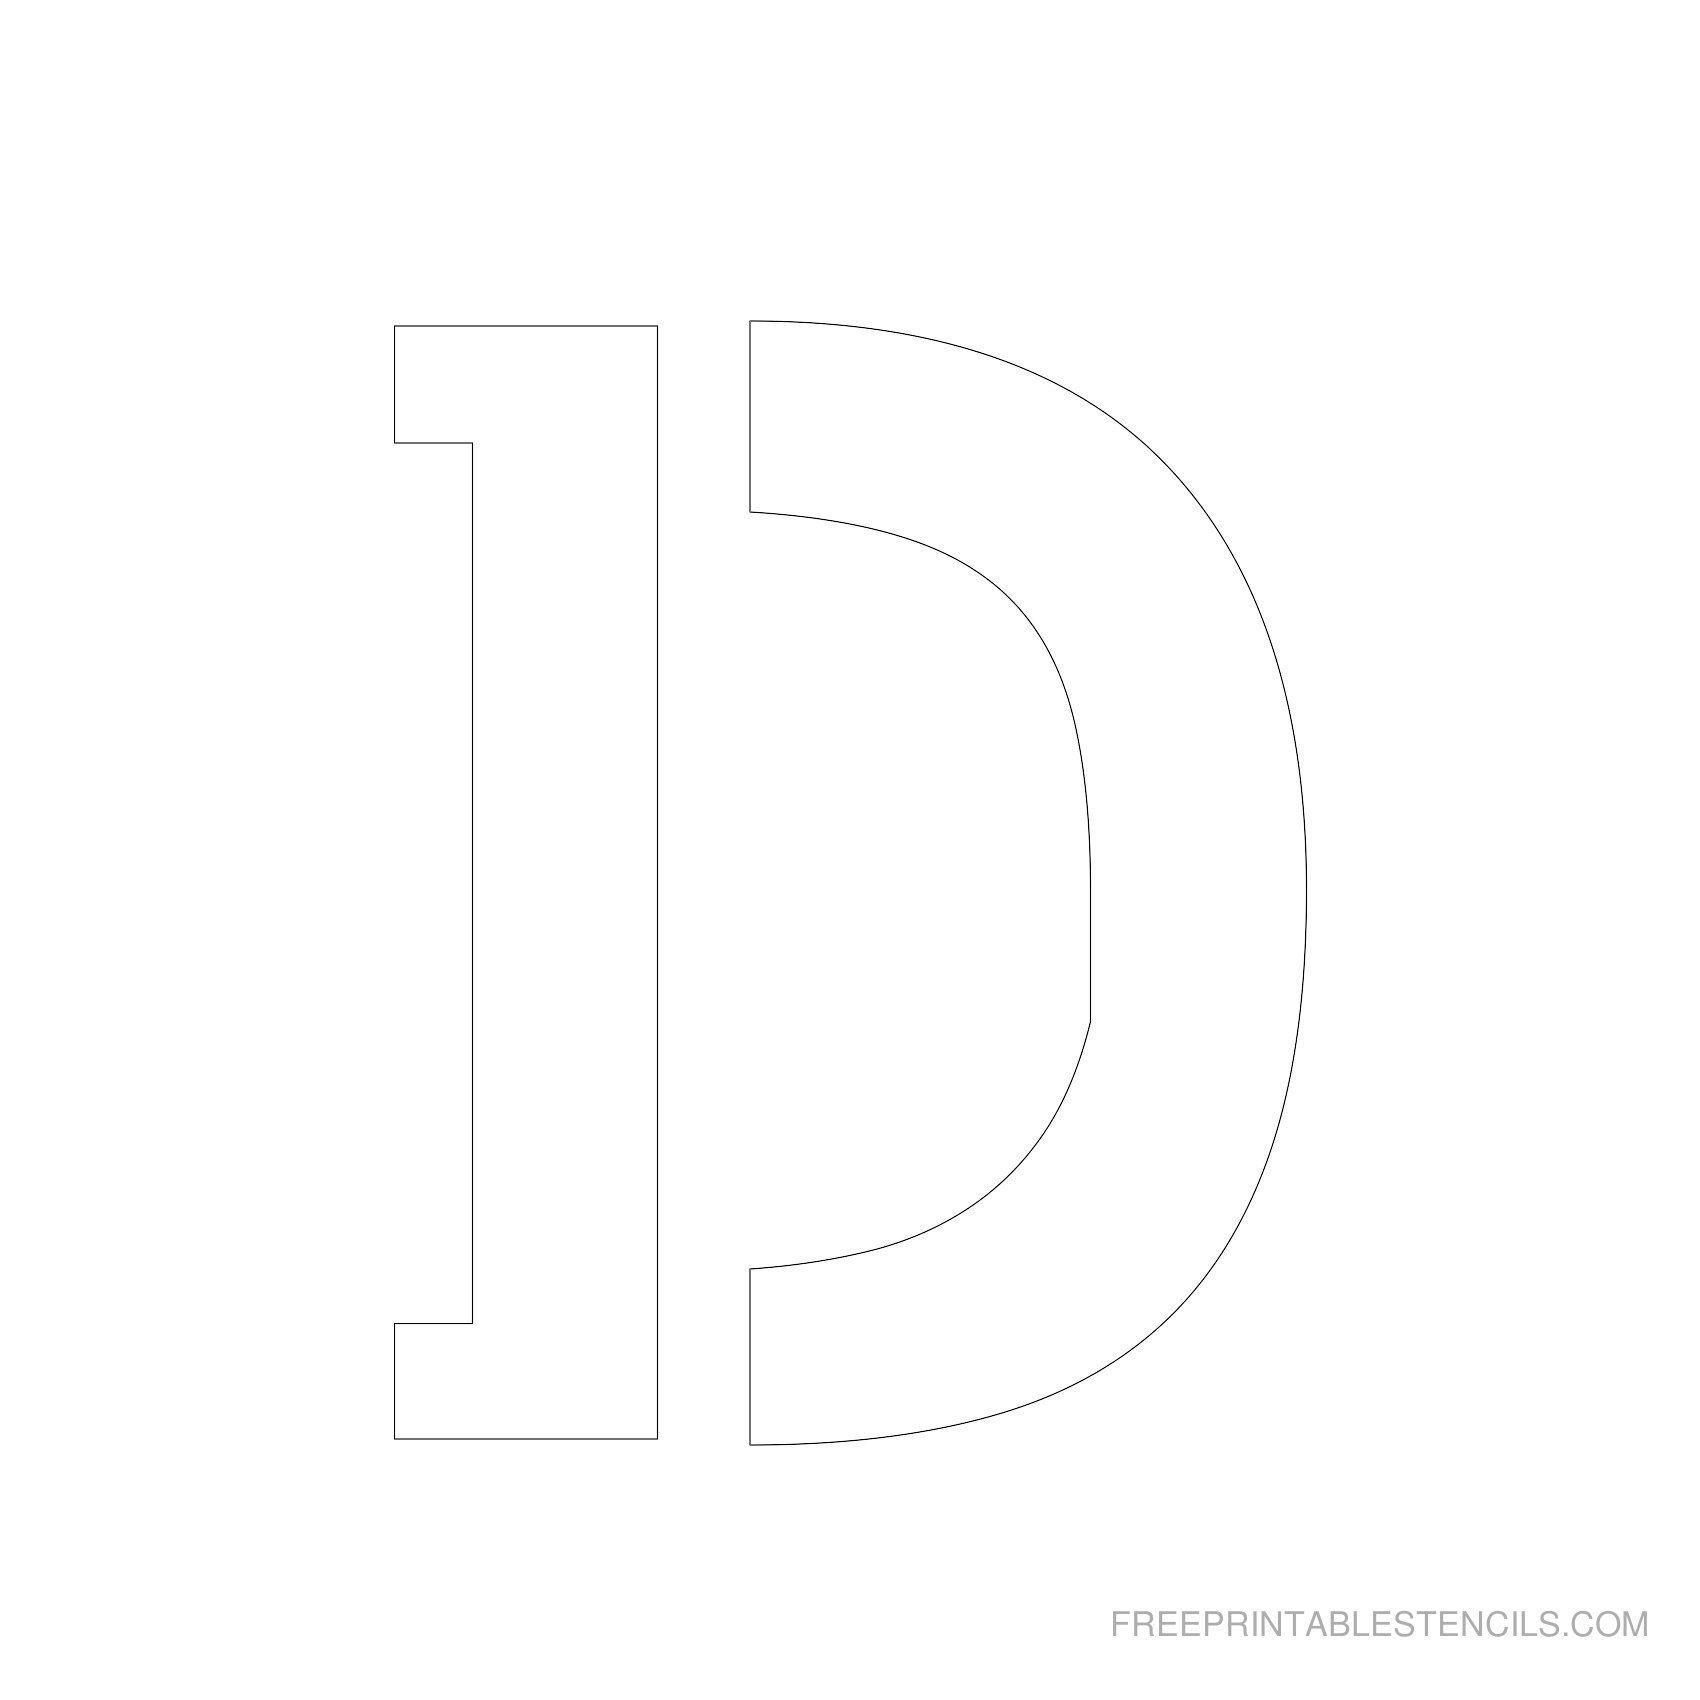 Printable 5 inch Letter Stencils | Lettering | Letter stencils